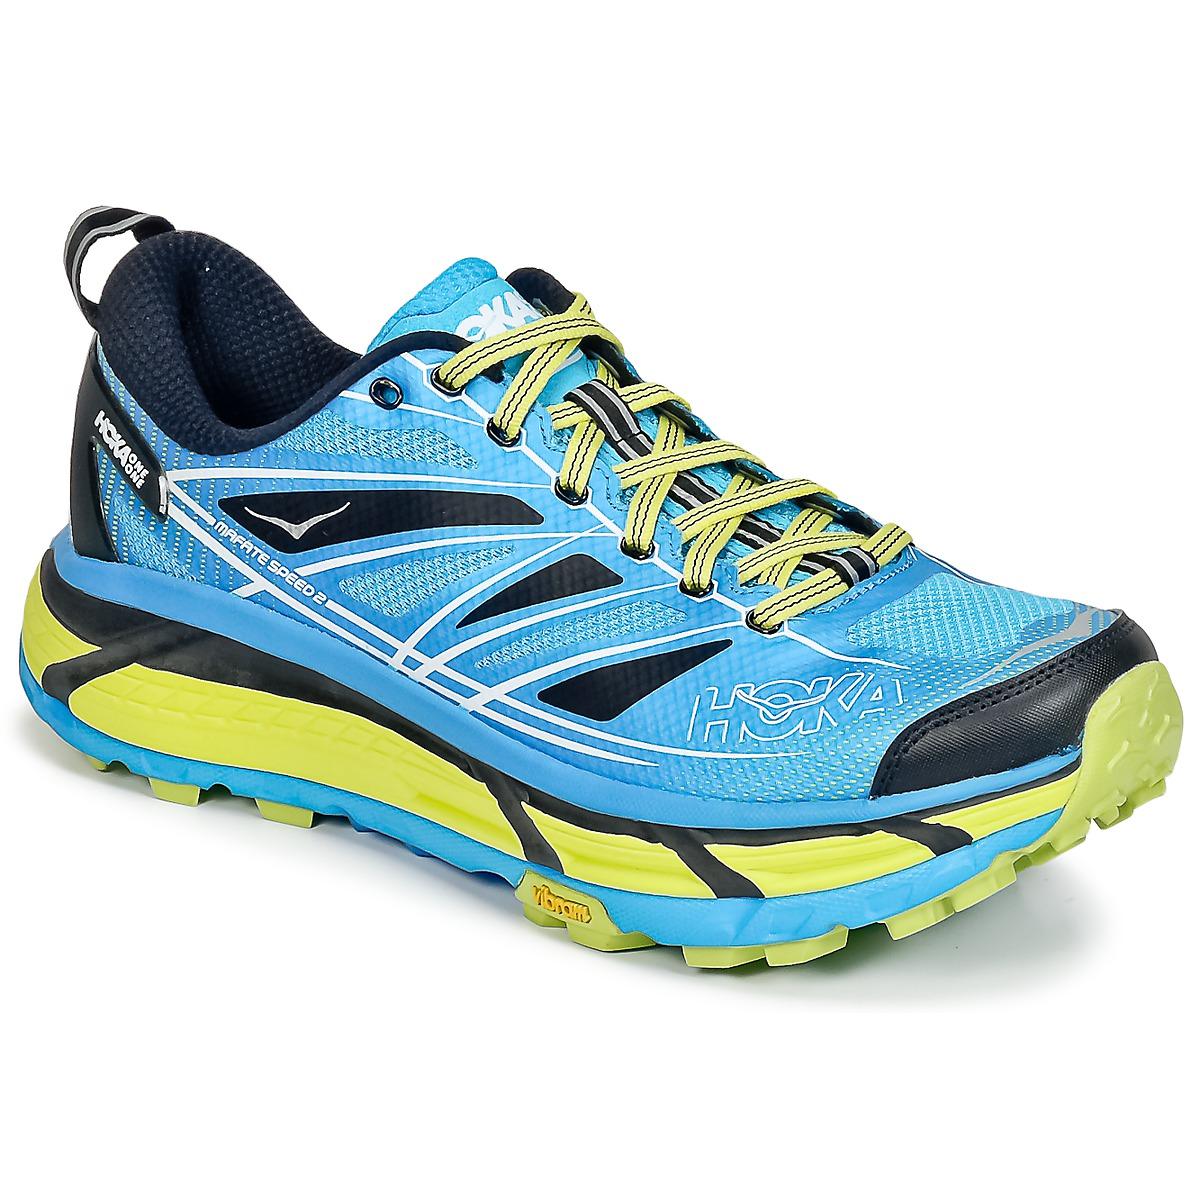 Chaussures-de-running Hoka one one MAFATE SPEED 2 Bleu